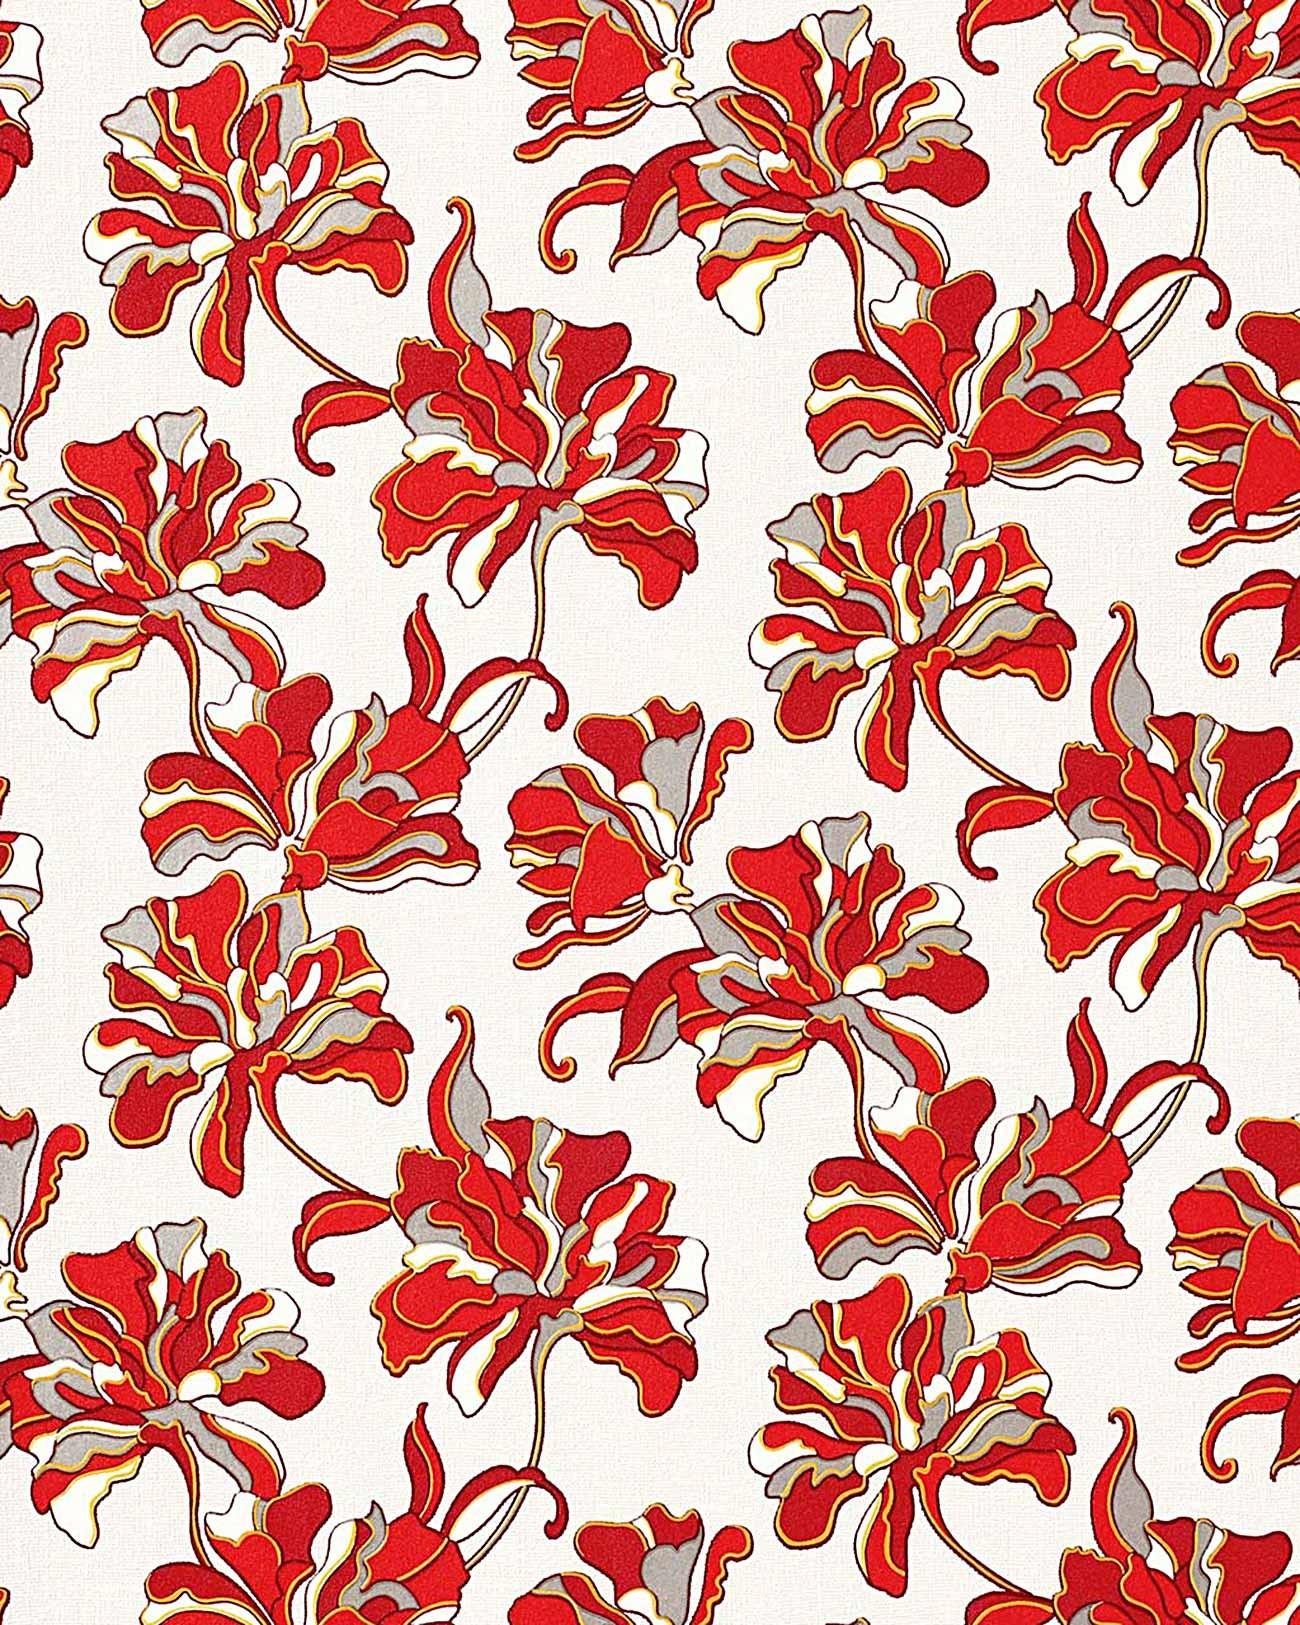 Flowers Textured Wall Covering Floral Edem 072 26 Wallpaper Vinyl